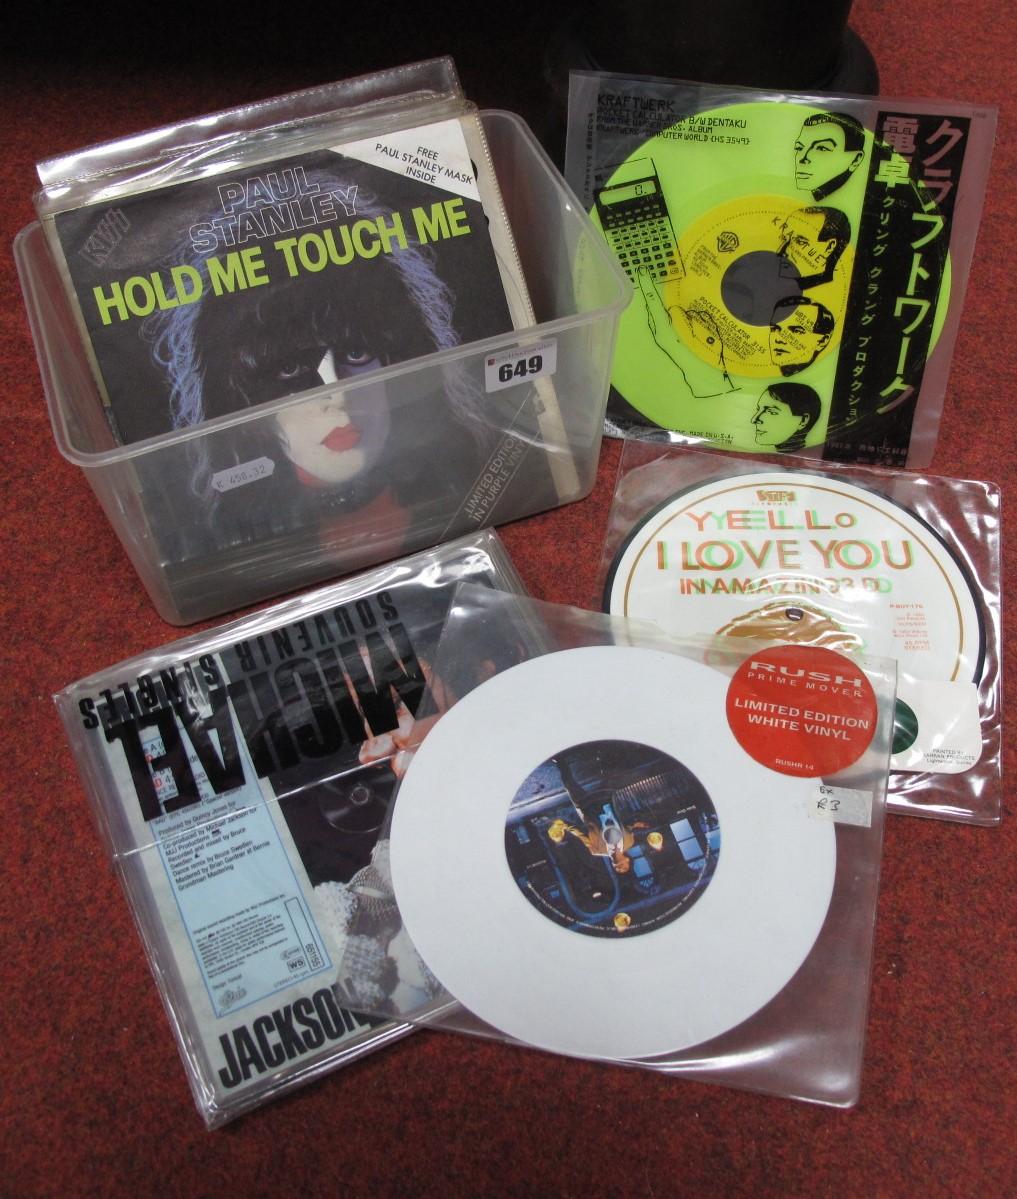 Lot 649 - Picture Disc/Coloured Vinyl - Michael Jackson Souvenir pack, Kraftwerk (yellow vinyl), Yello 'I Love